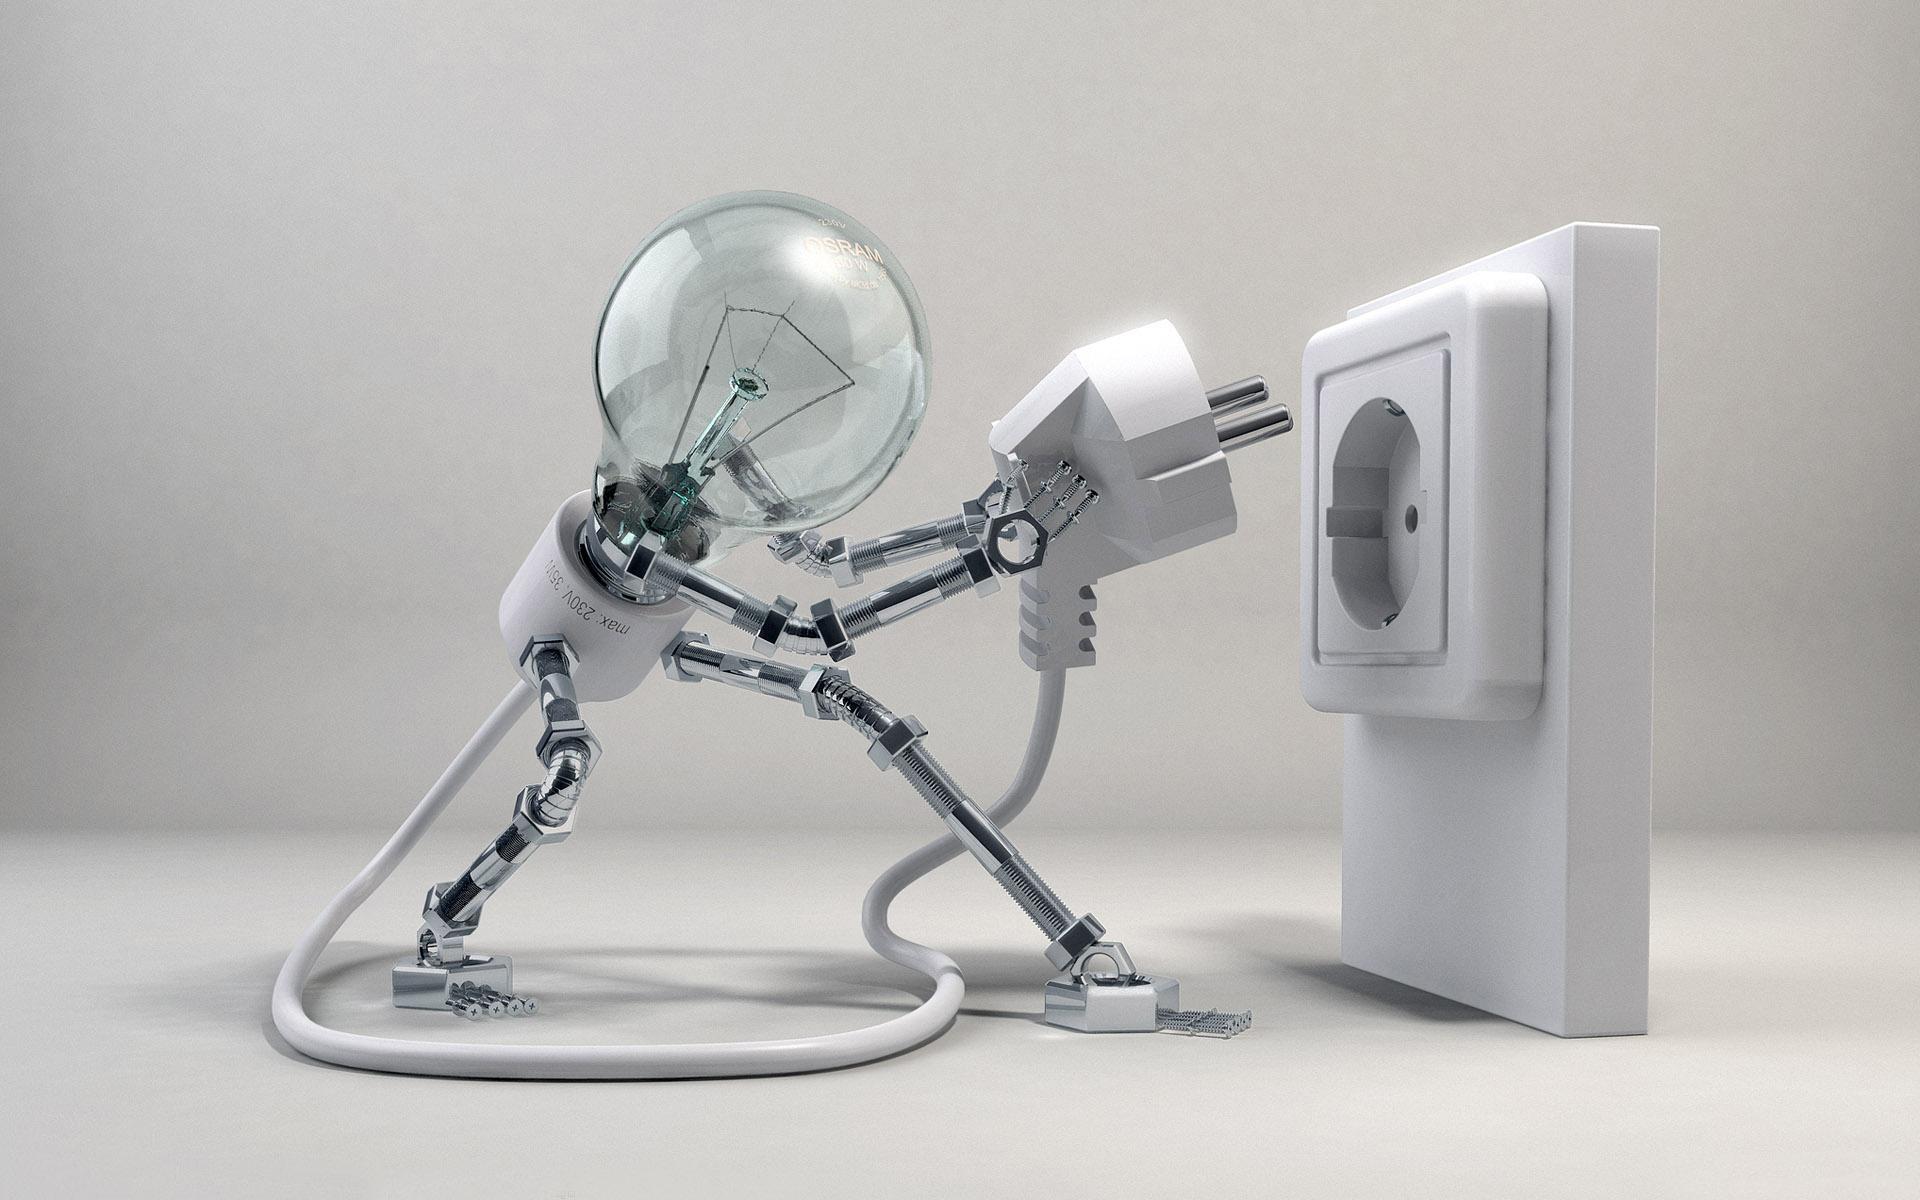 CGI - Other  Plug Socket Cord Bulb Light Lamb Wallpaper